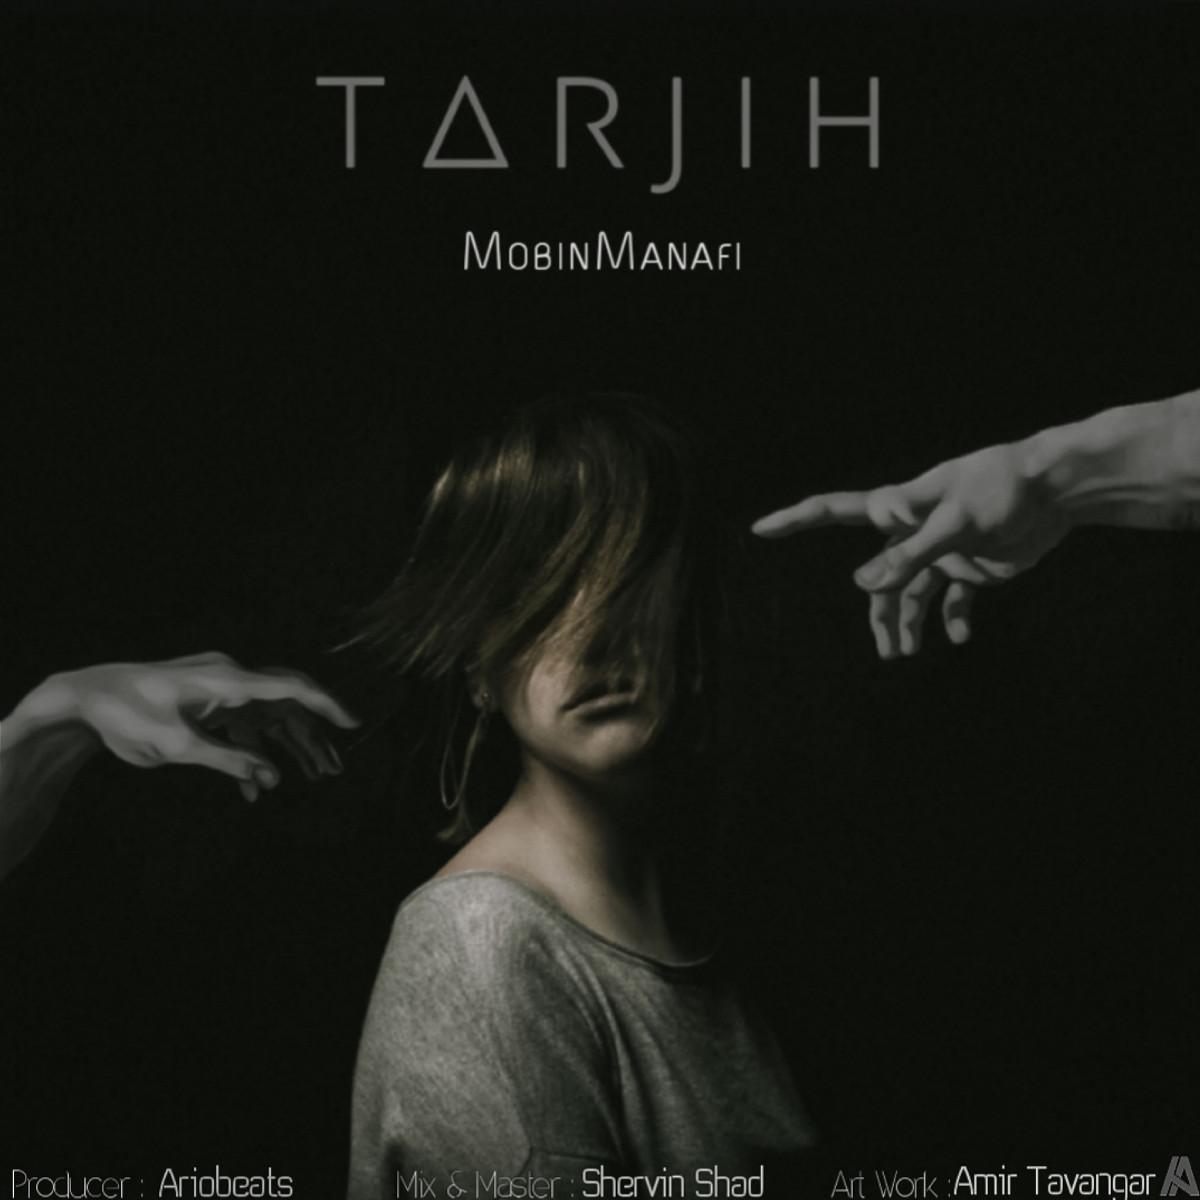 Mobin Manafi - Tarjih